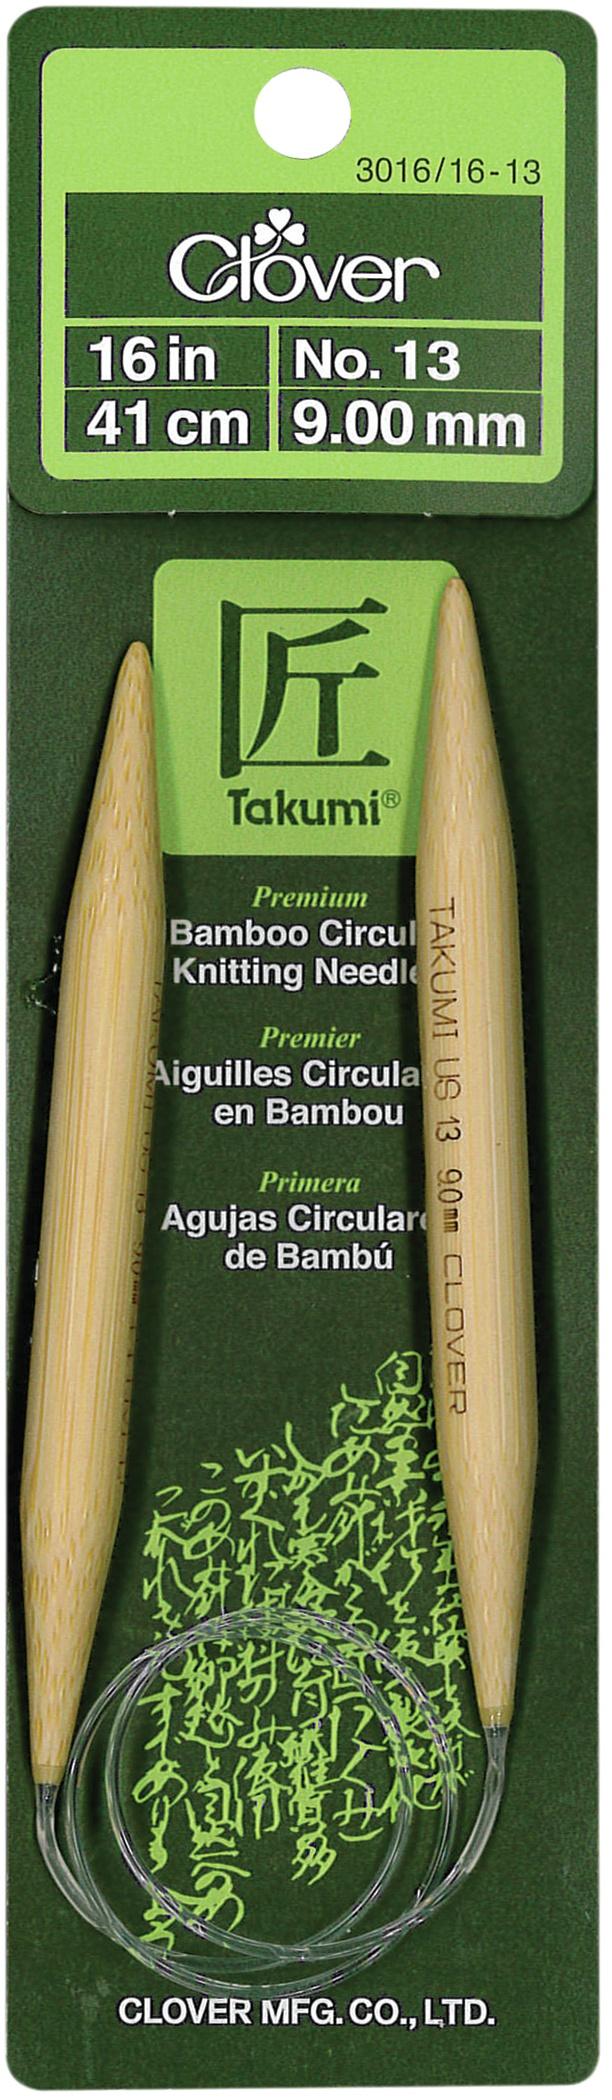 Takumi Bamboo Circular Knitting Needles 16-Size 13/9mm